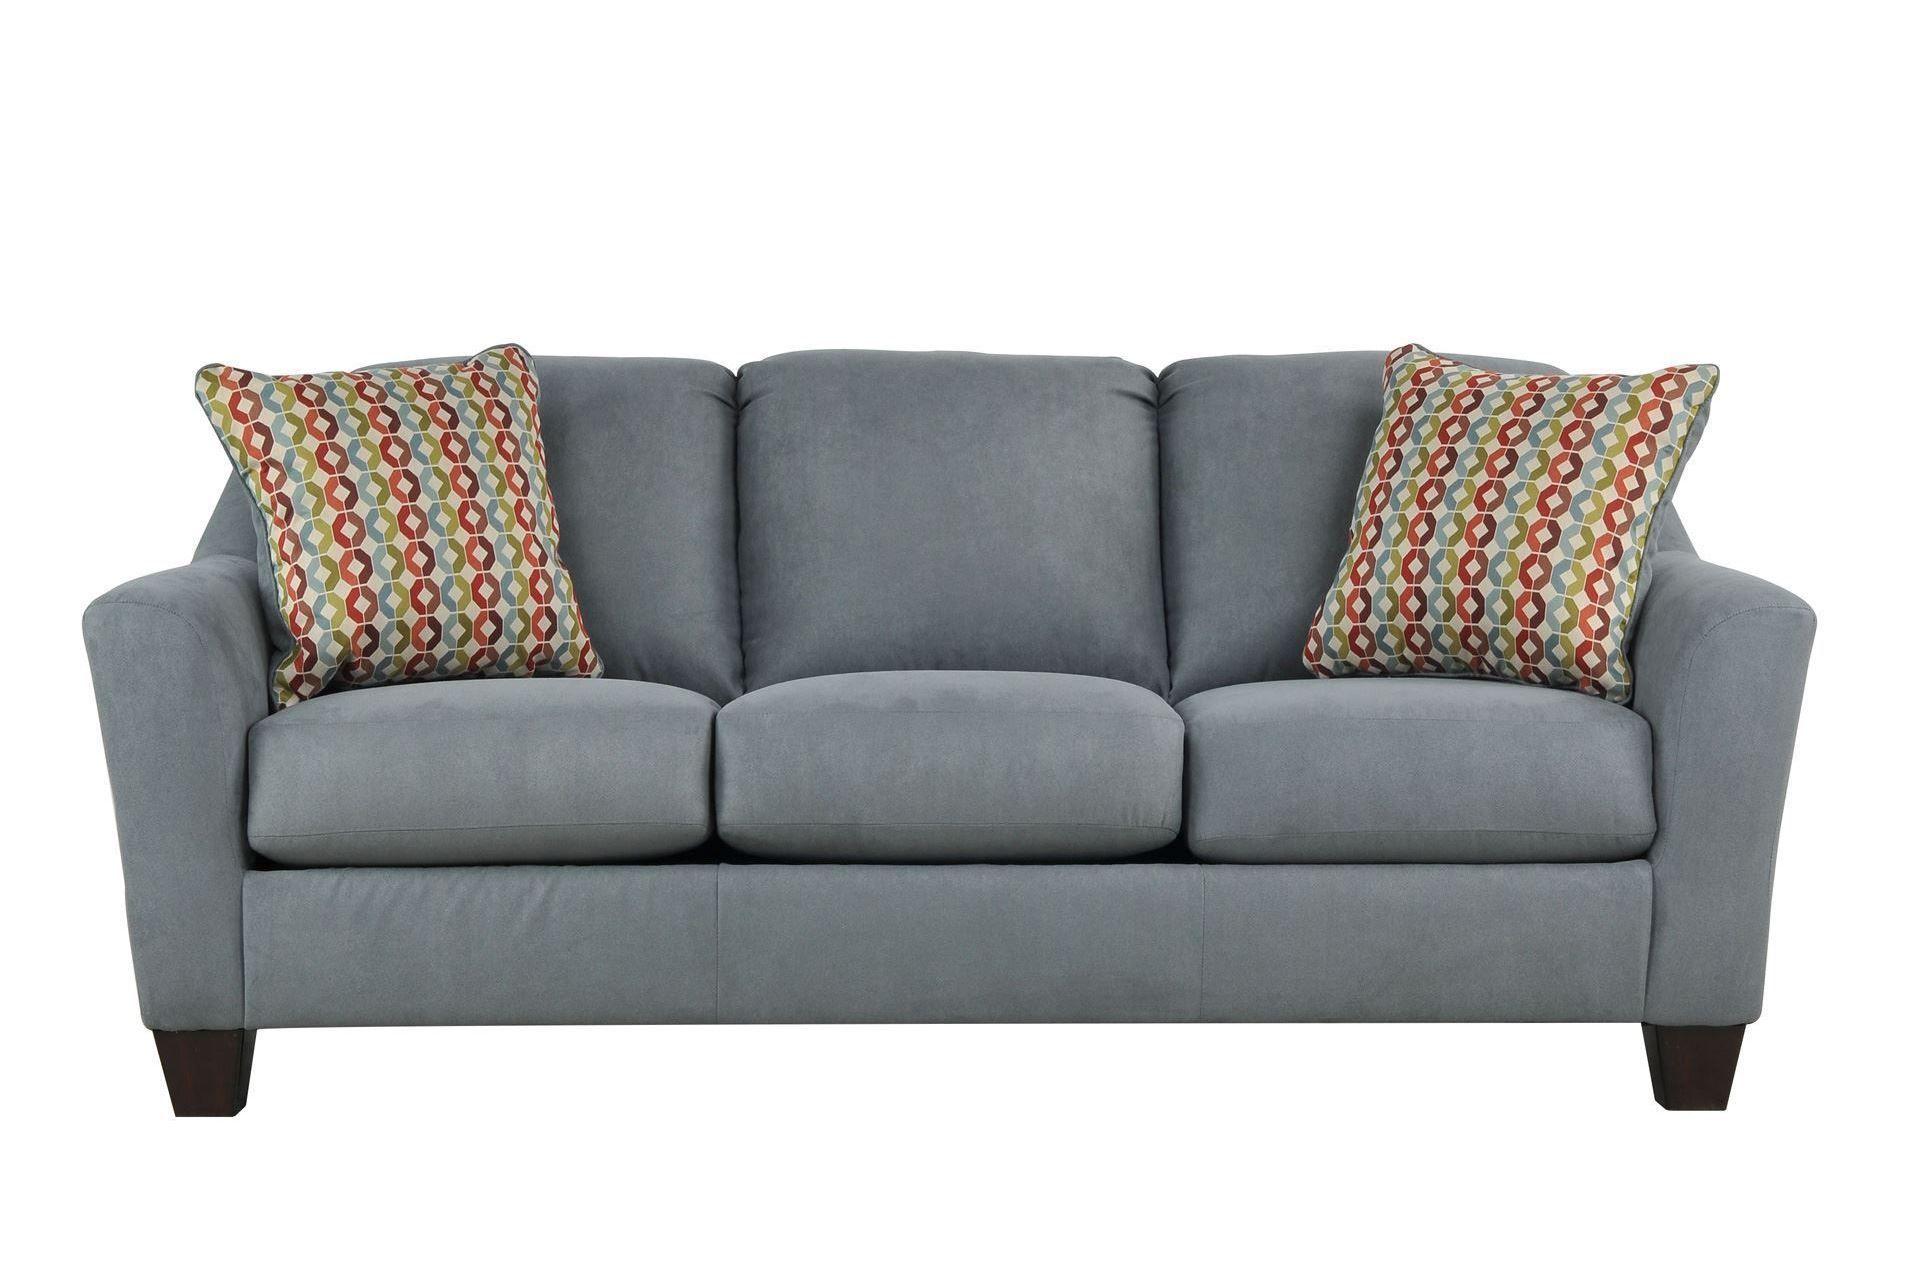 Fine Hannin Lagoon Sofa At Living Spaces Mi Casa Ashley Sofa Interior Design Ideas Gentotthenellocom